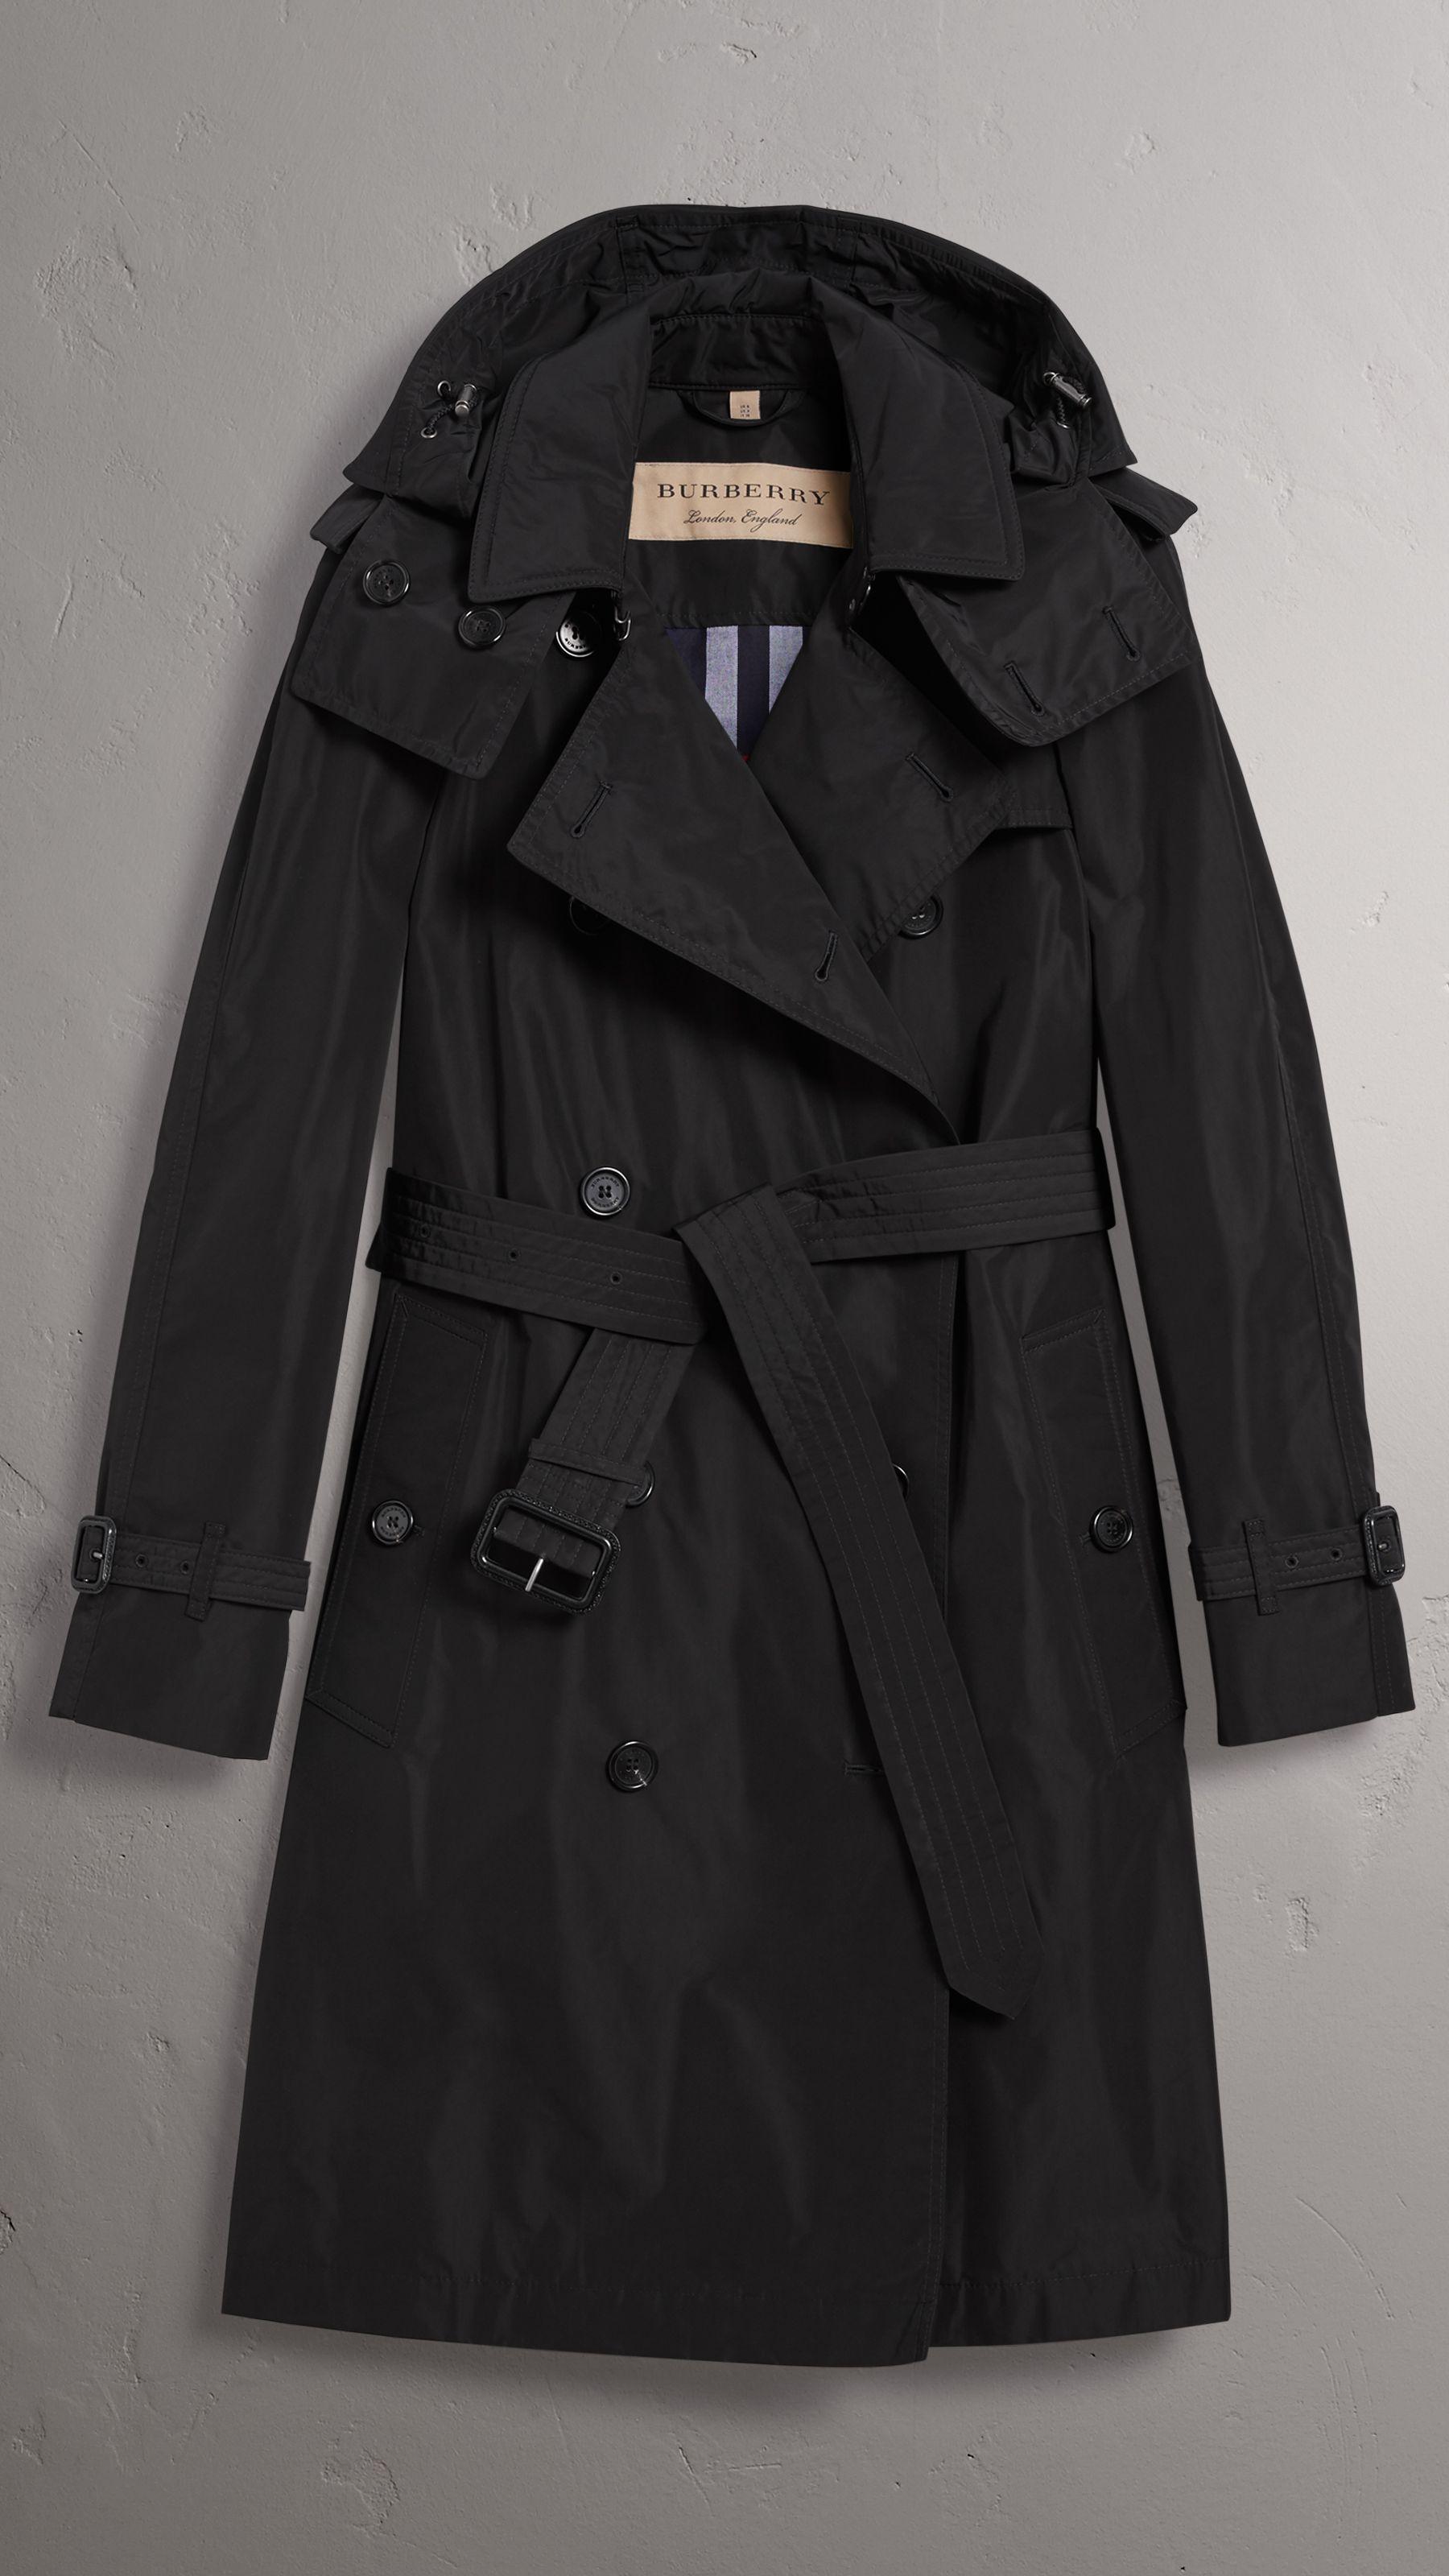 b6c10d9f28f Detachable Hood Taffeta Trench Coat in Black - Women | Burberry ...